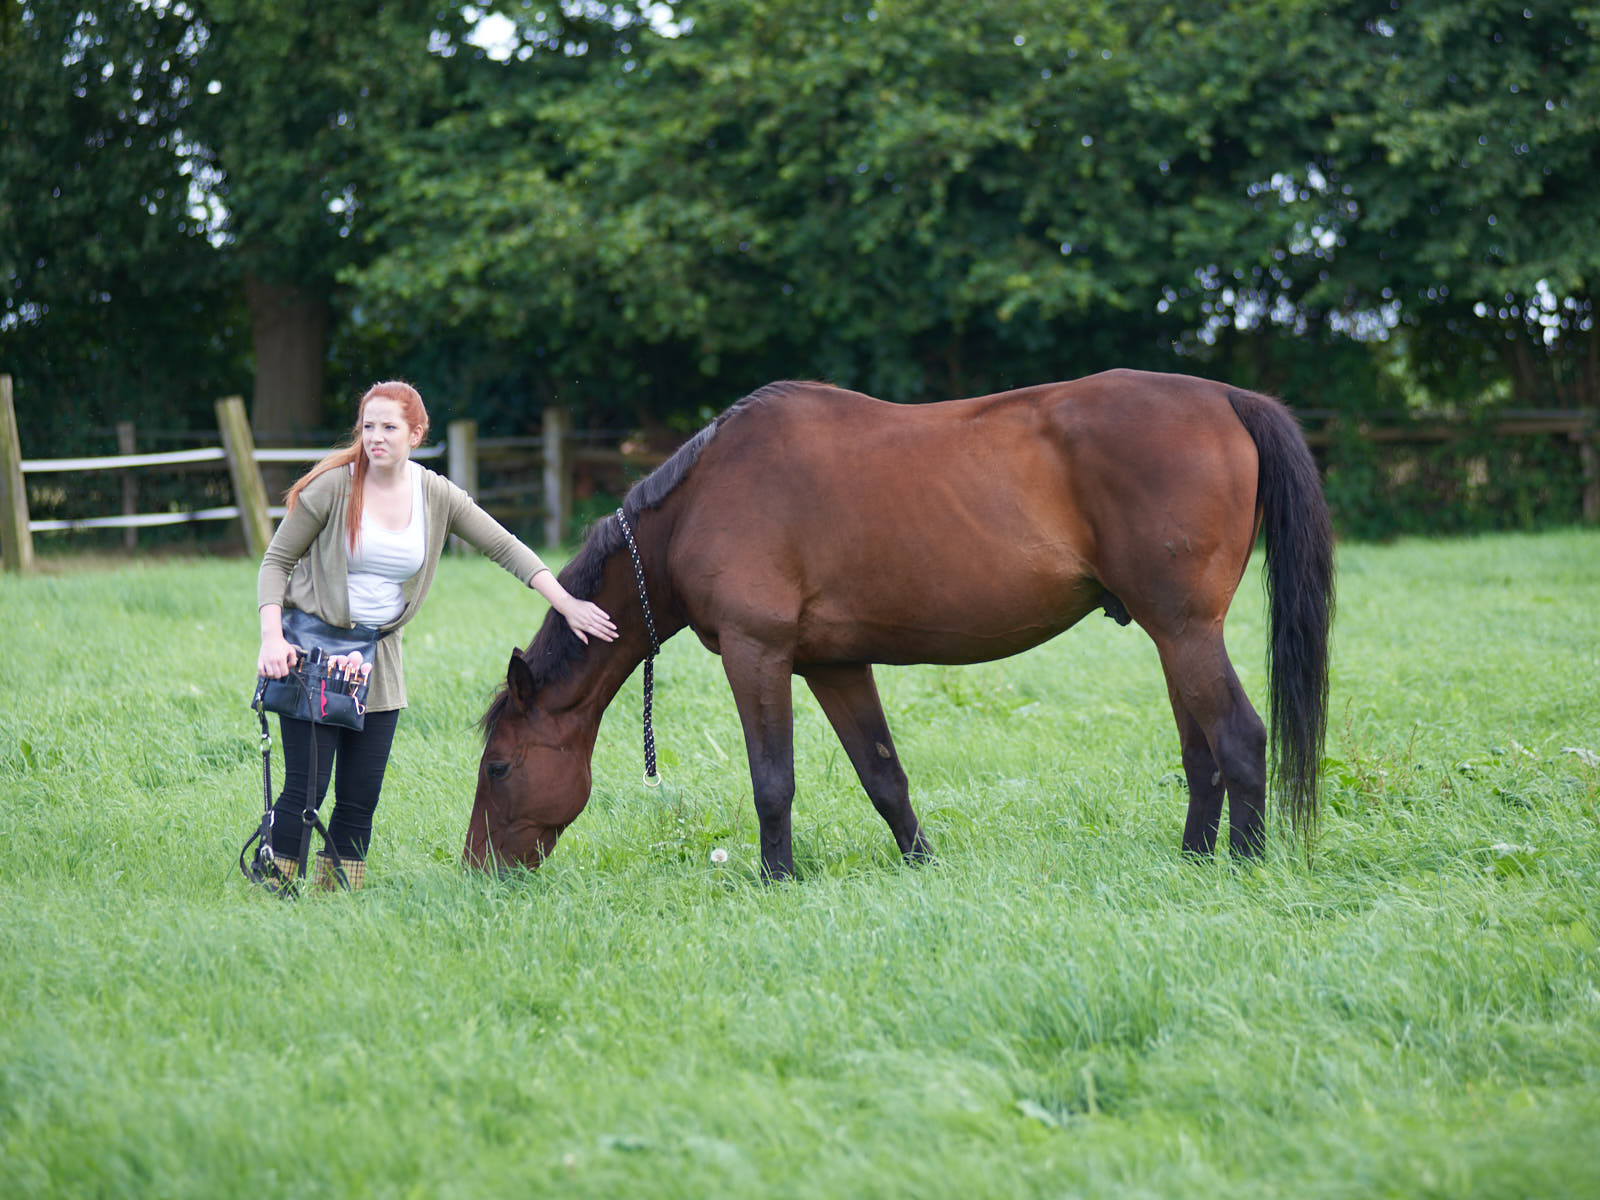 2017-07-13-summergirl-and-horse5450.jpg